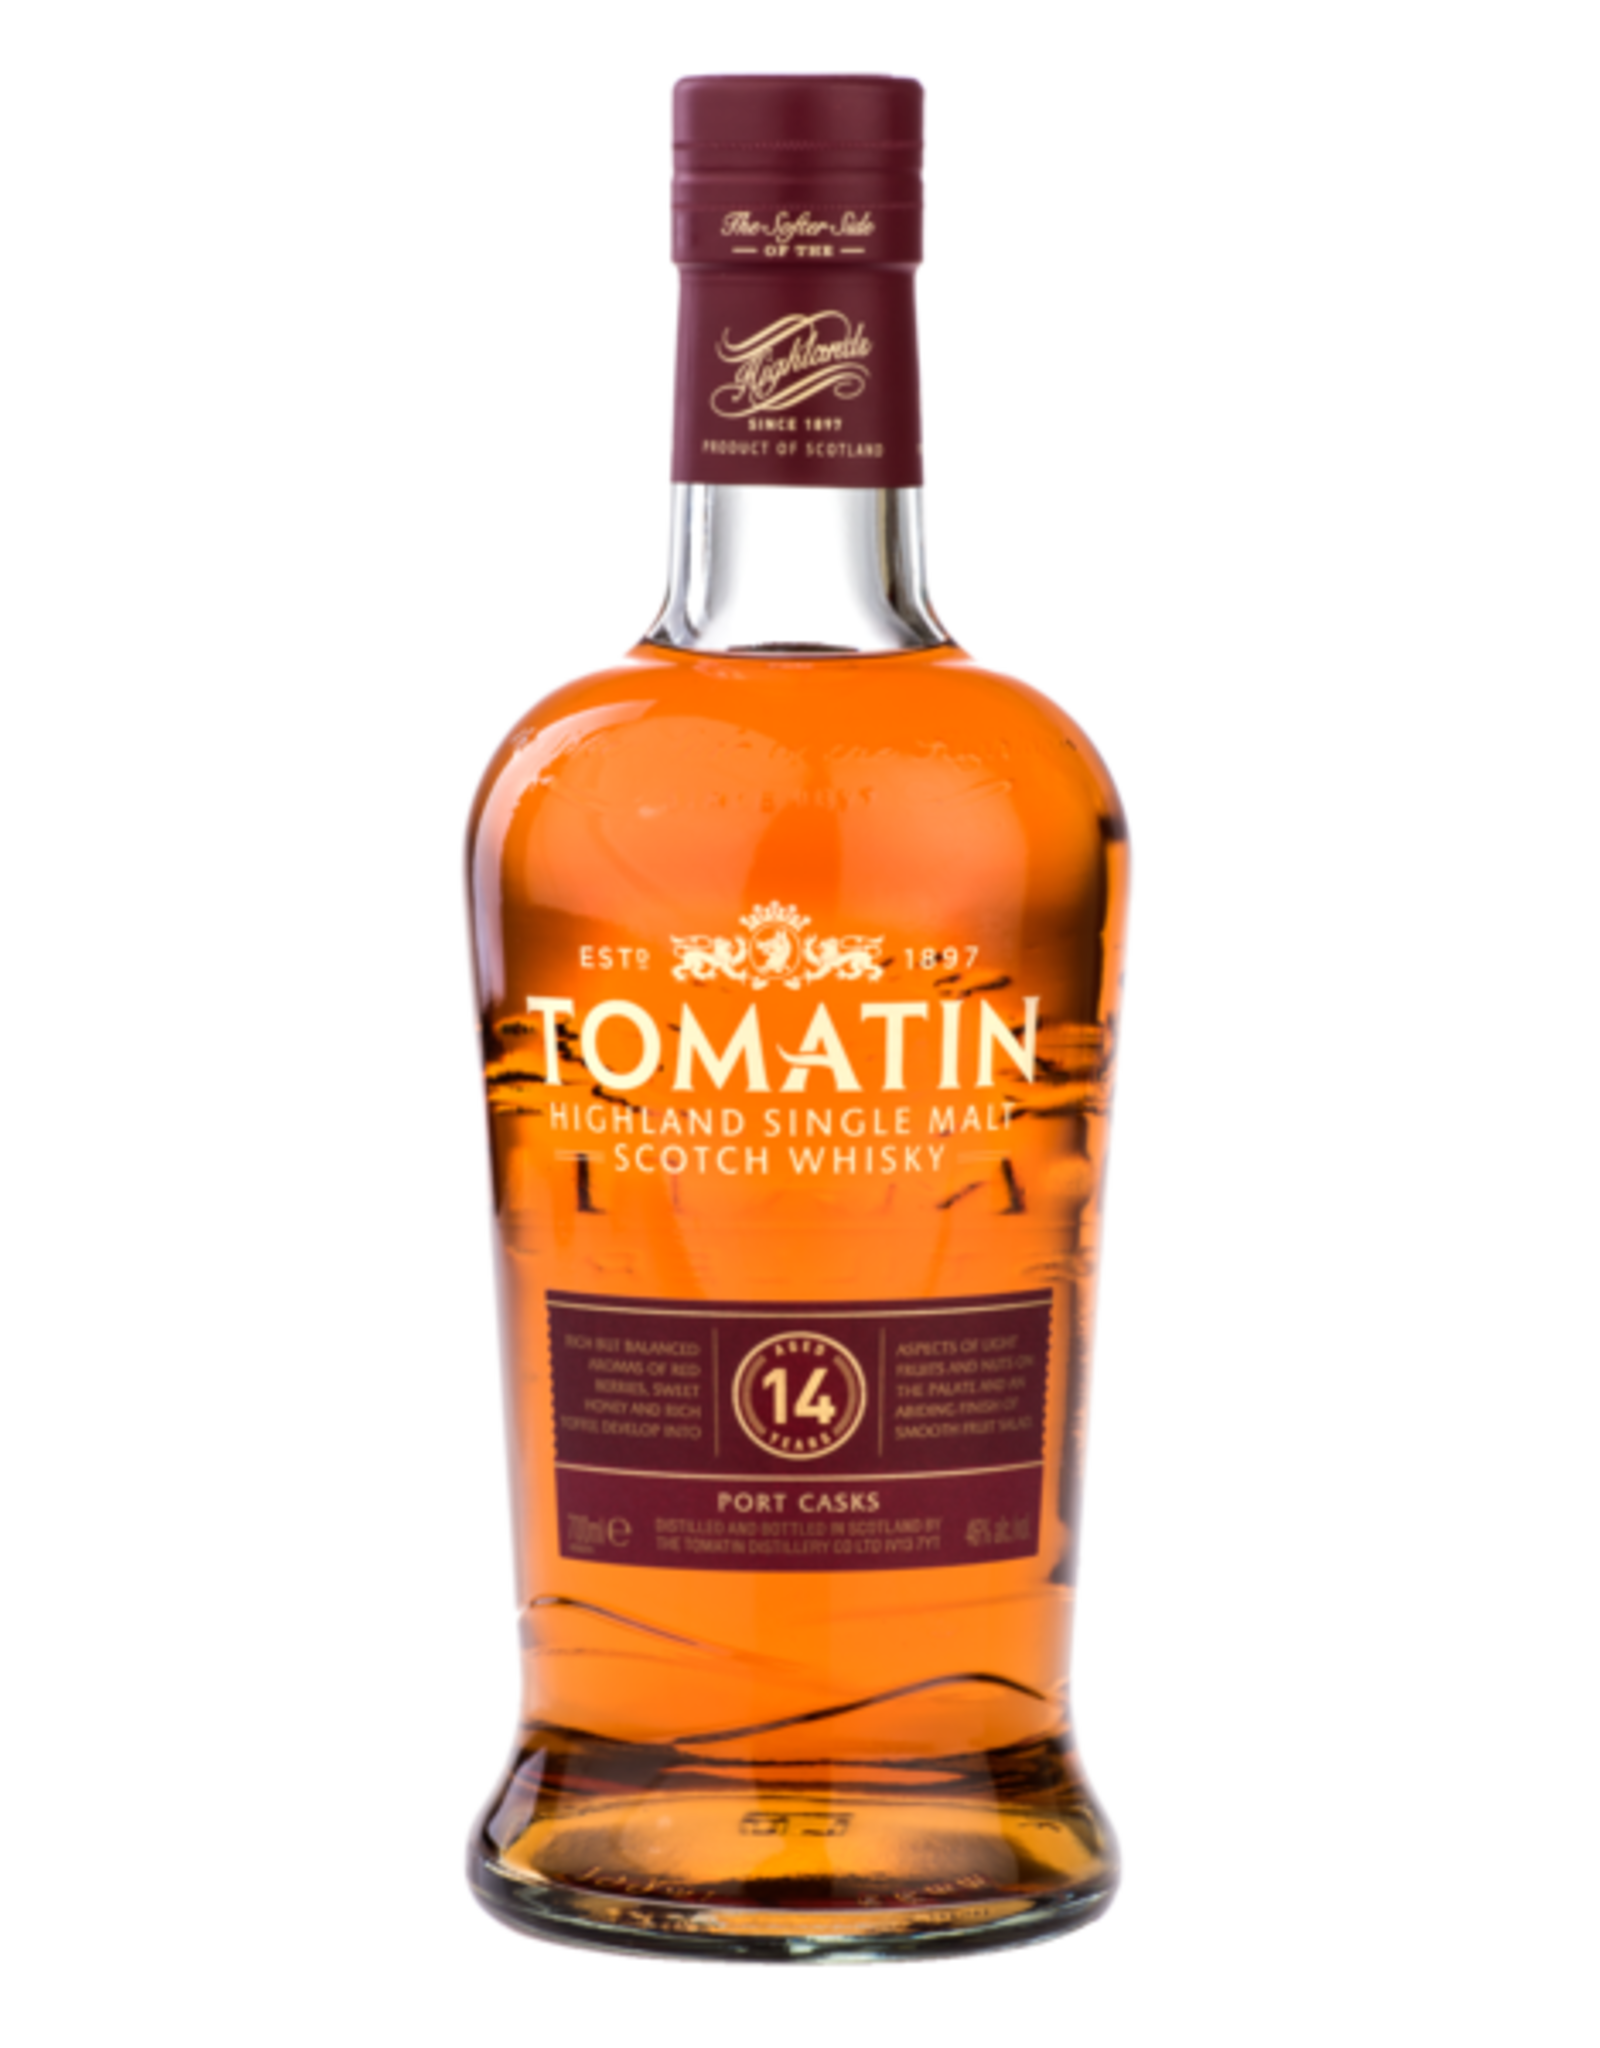 Tomatin Single Malt Scotch Whiskey 14 Year